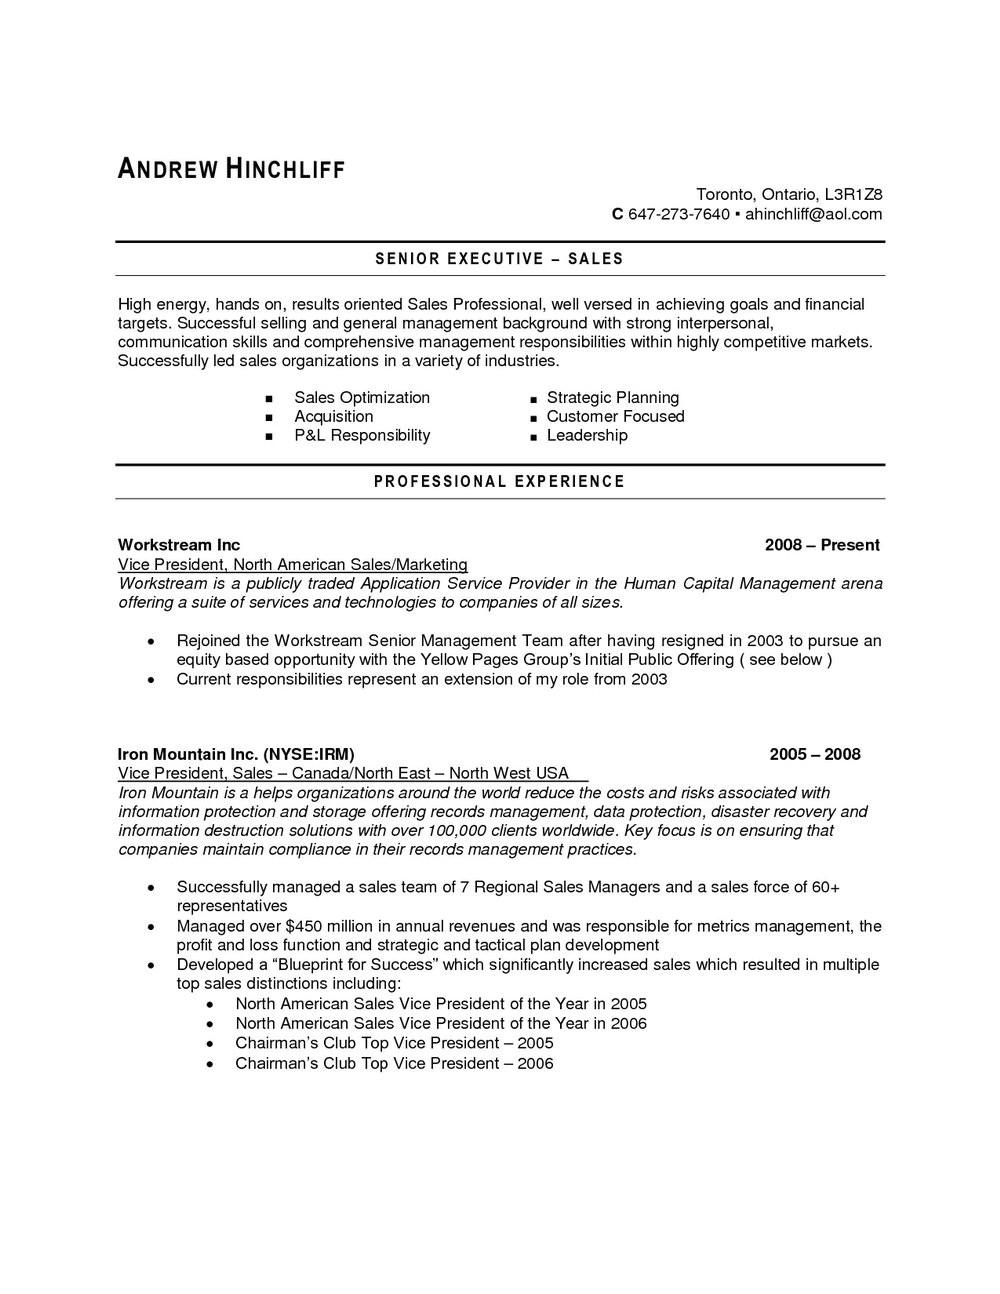 sample resume for jobs in canada